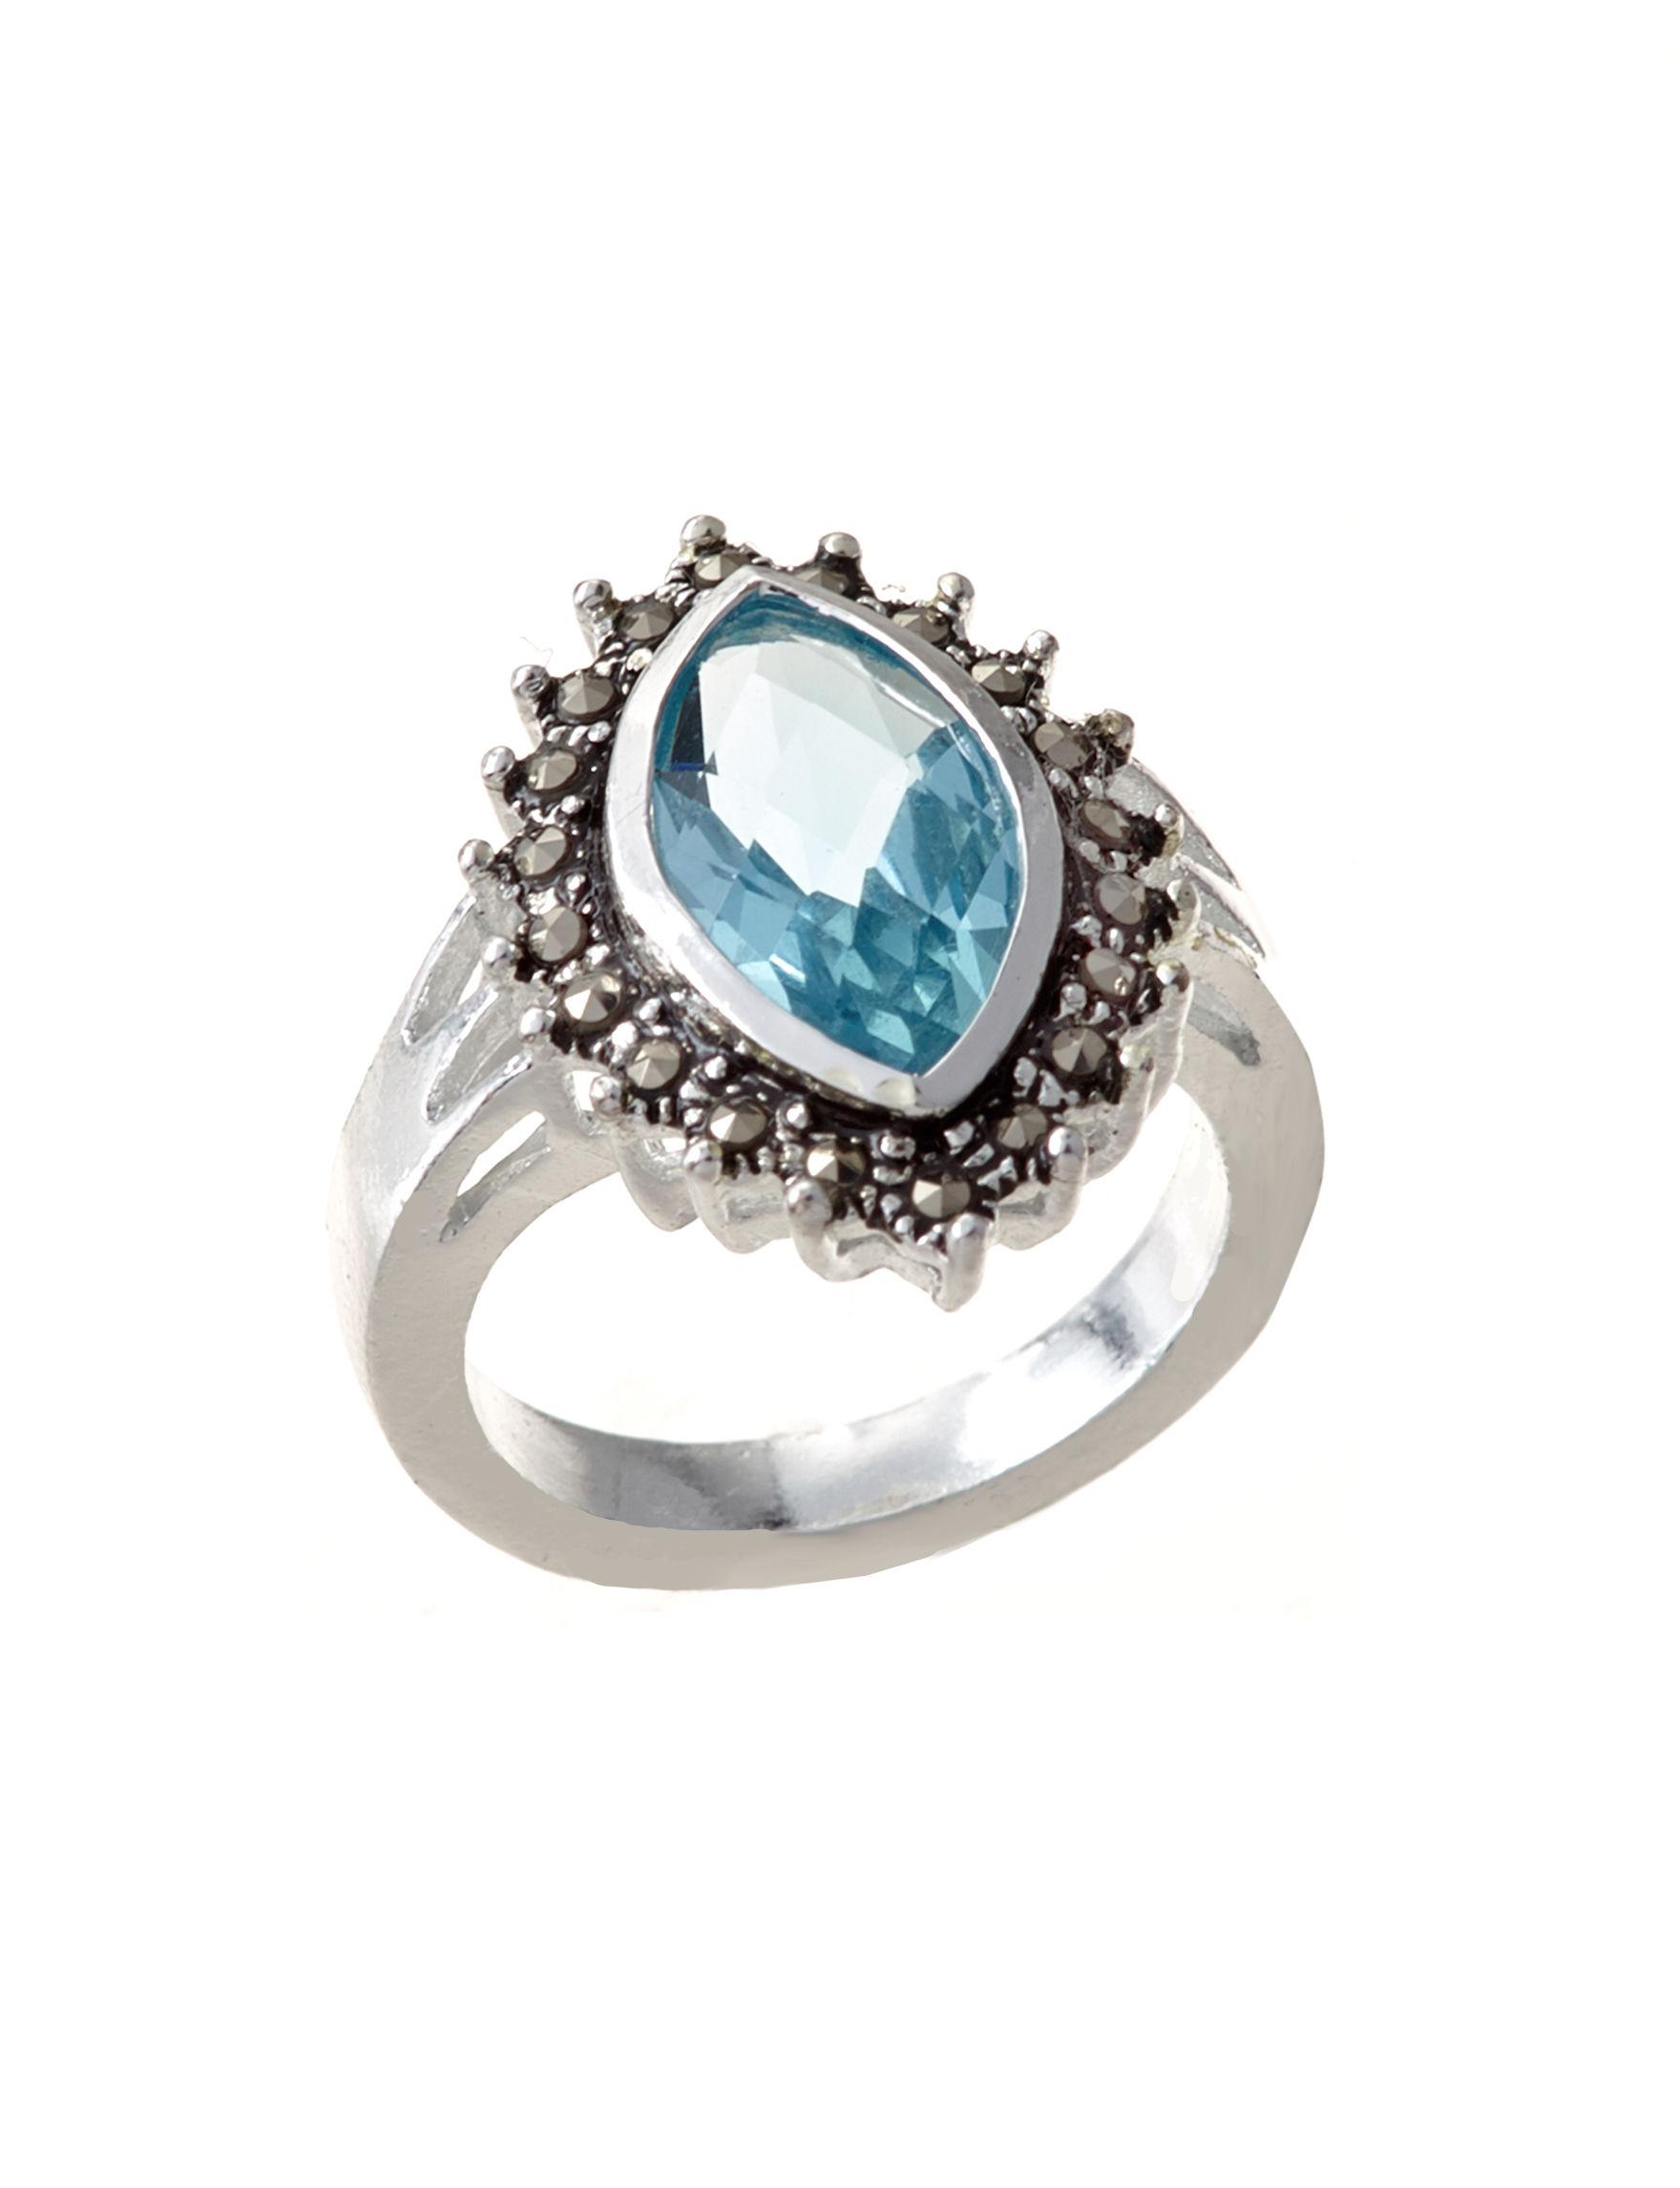 Marsala Aqua Rings Fine Jewelry